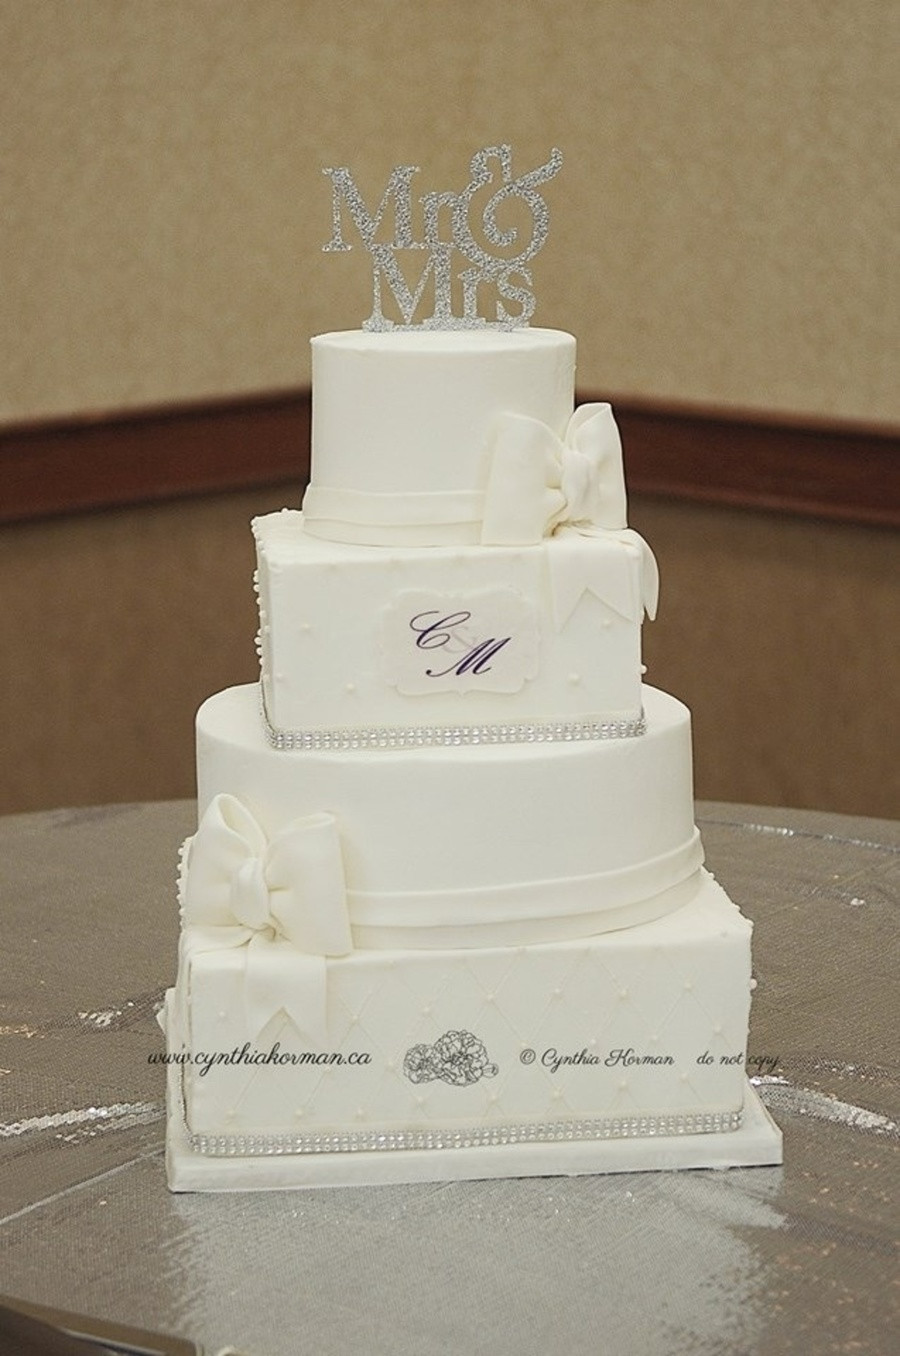 Square And Round Wedding Cakes  Alternating Square And Round Wedding Cake CakeCentral